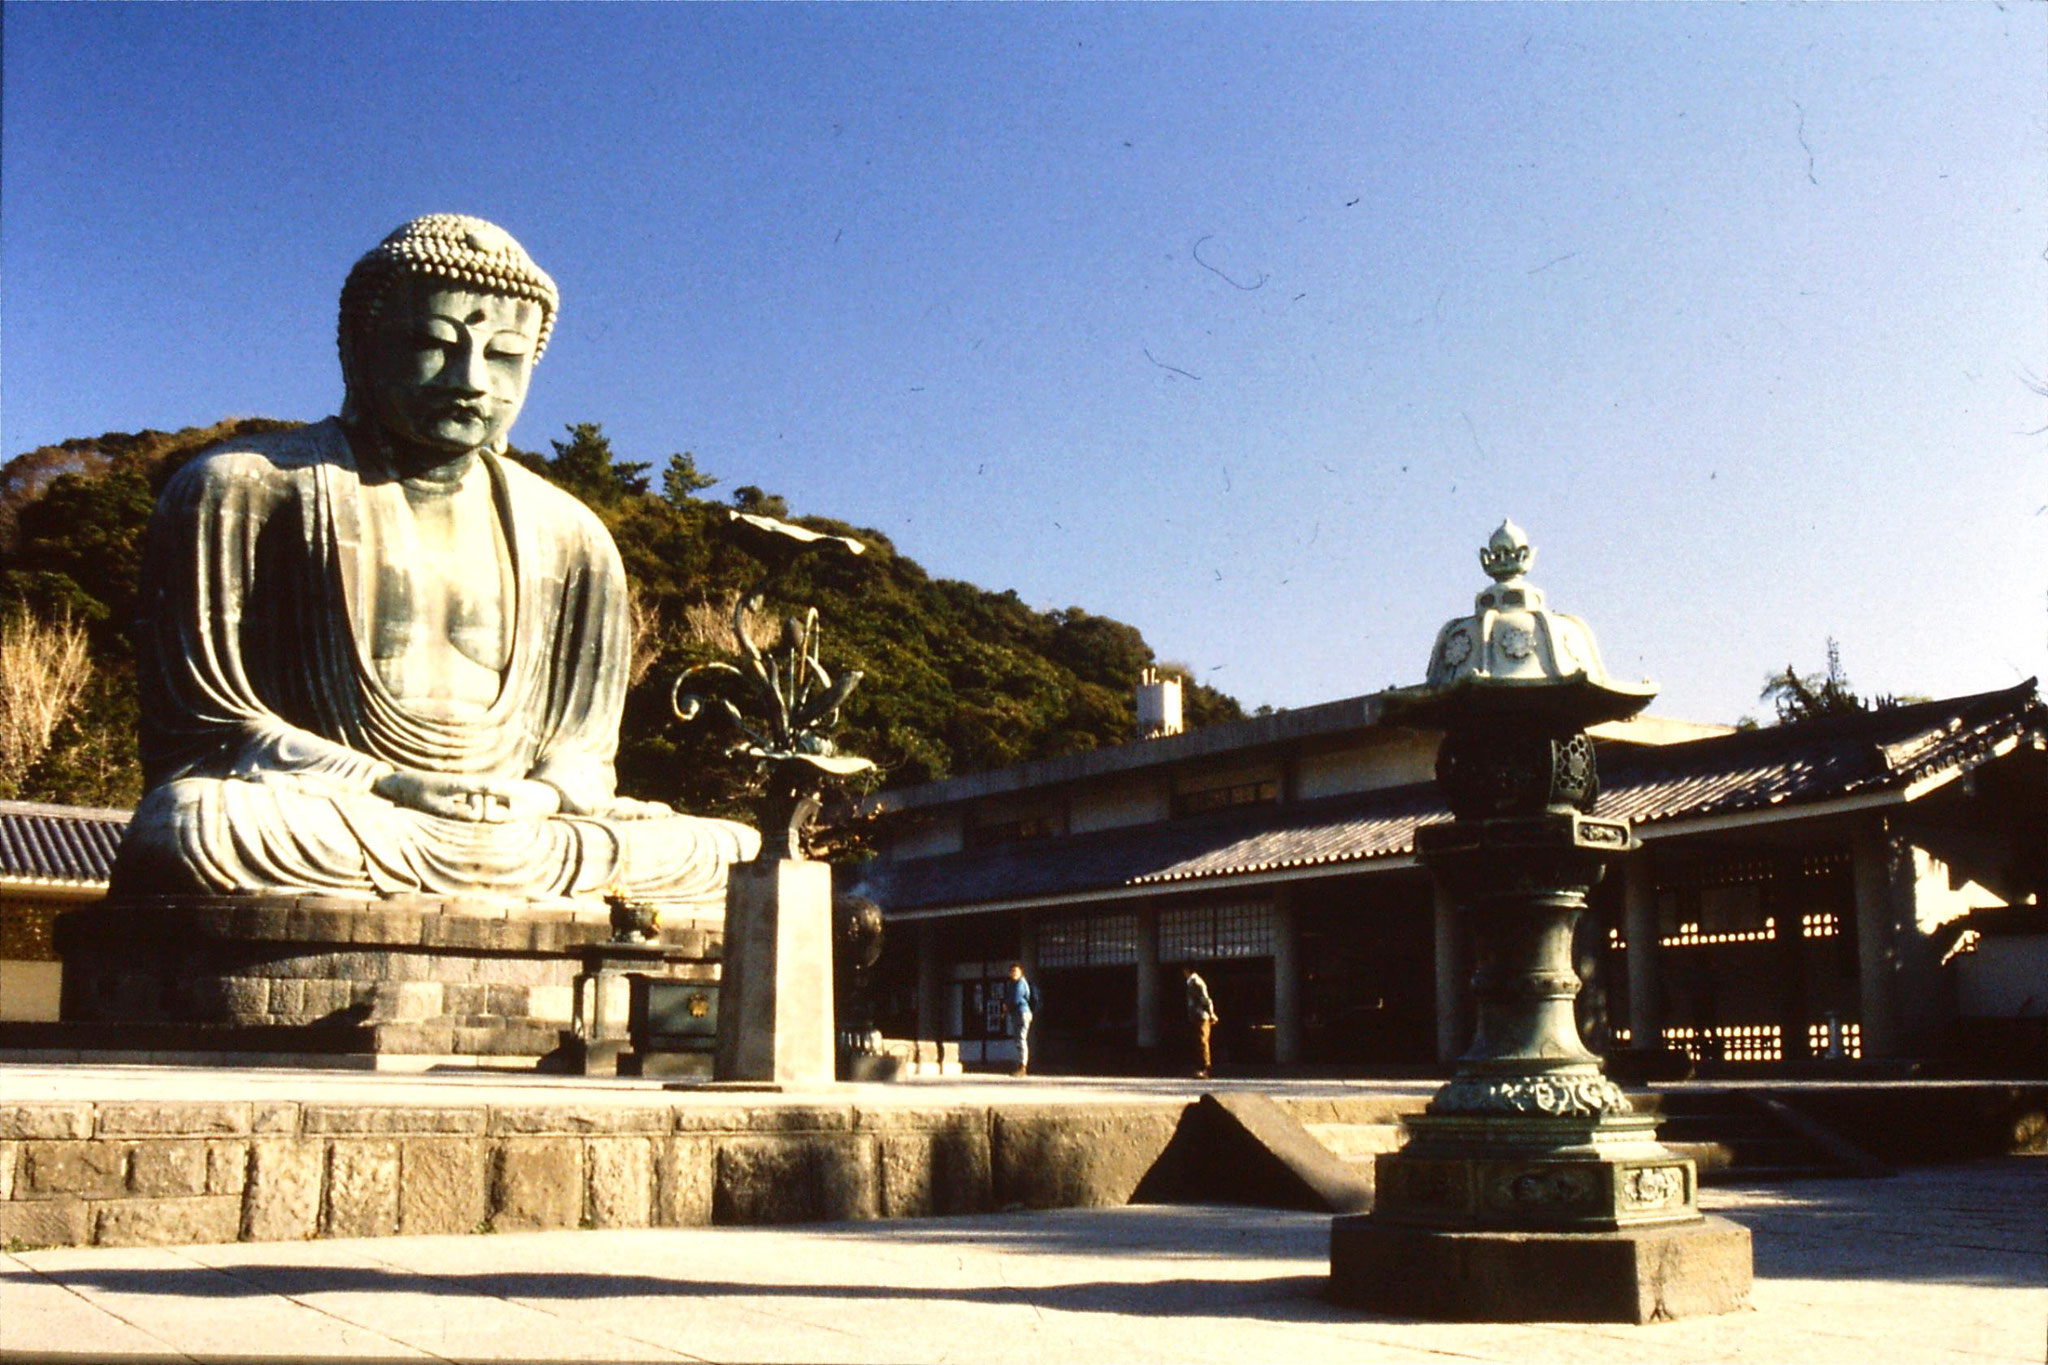 29/1/1989: 33: Daibutsu at Kamakura